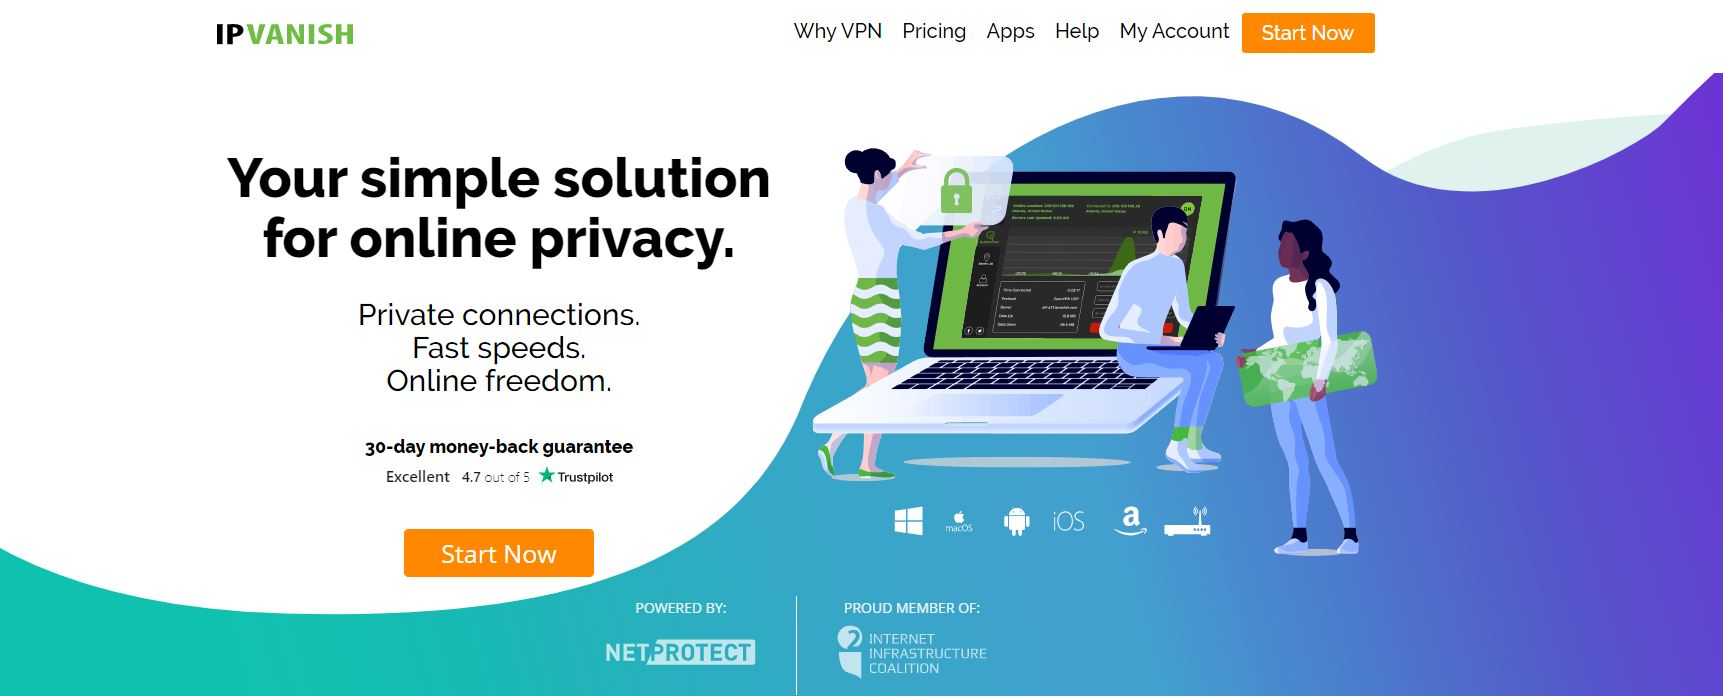 IPVanish VPN website